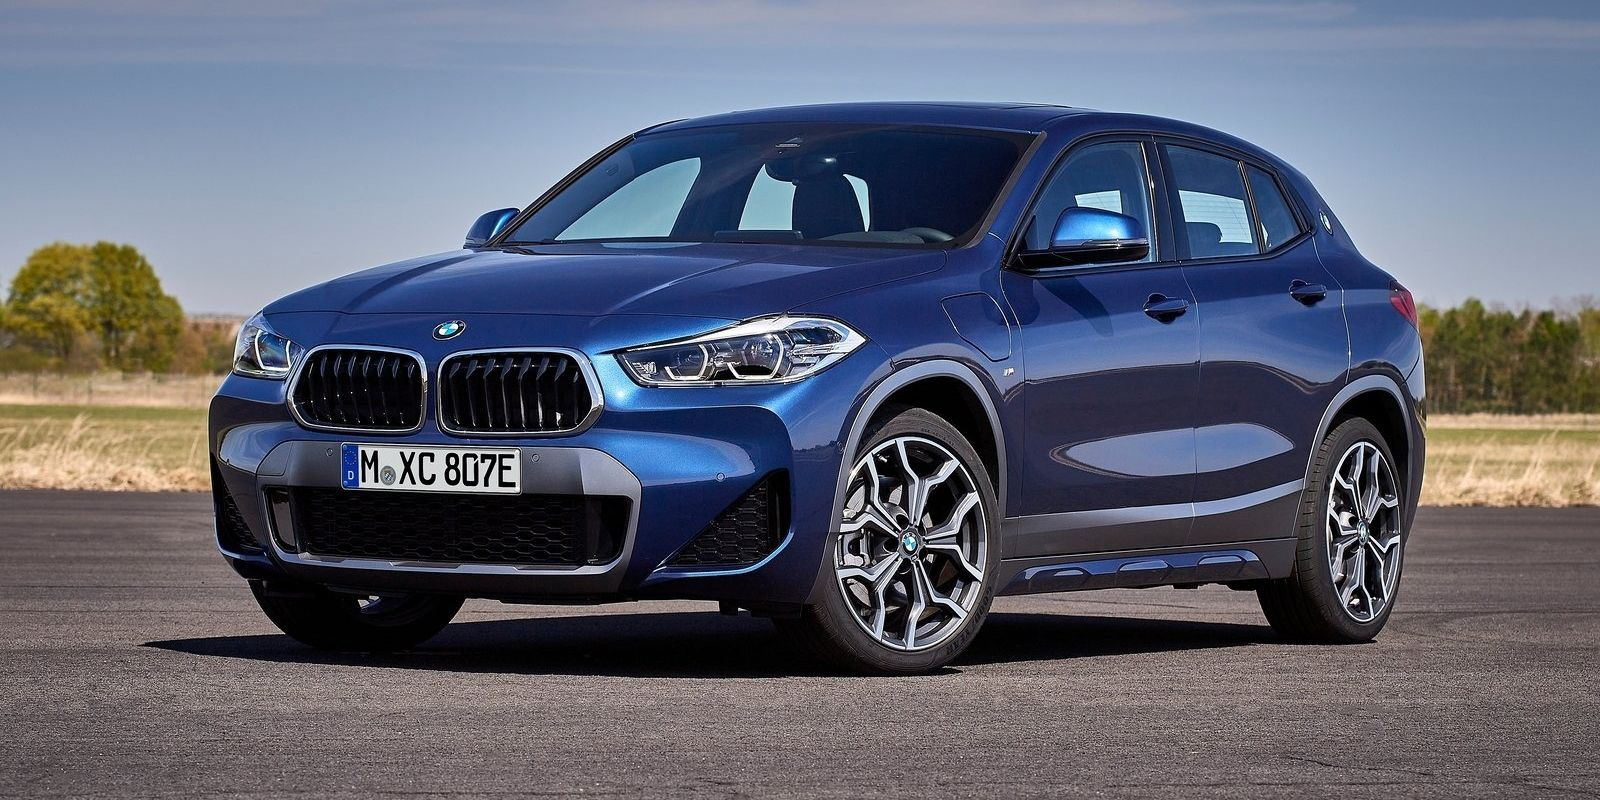 2021 BMW 220D Xdrive Configurations